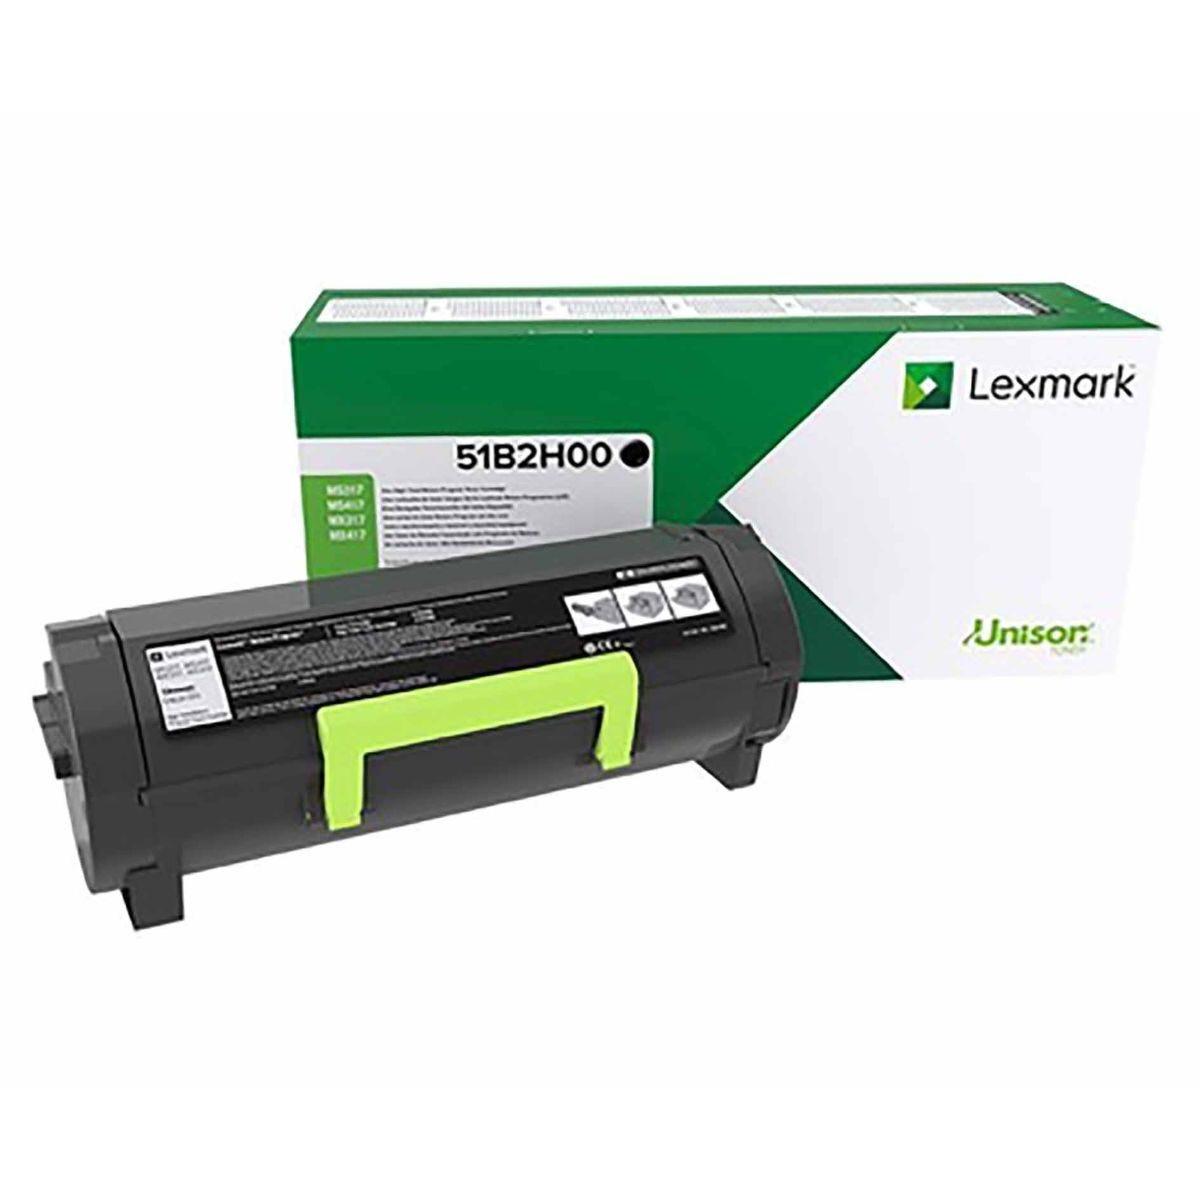 Lexmark 51B2H00 High Yield Black Original Toner Cartridge